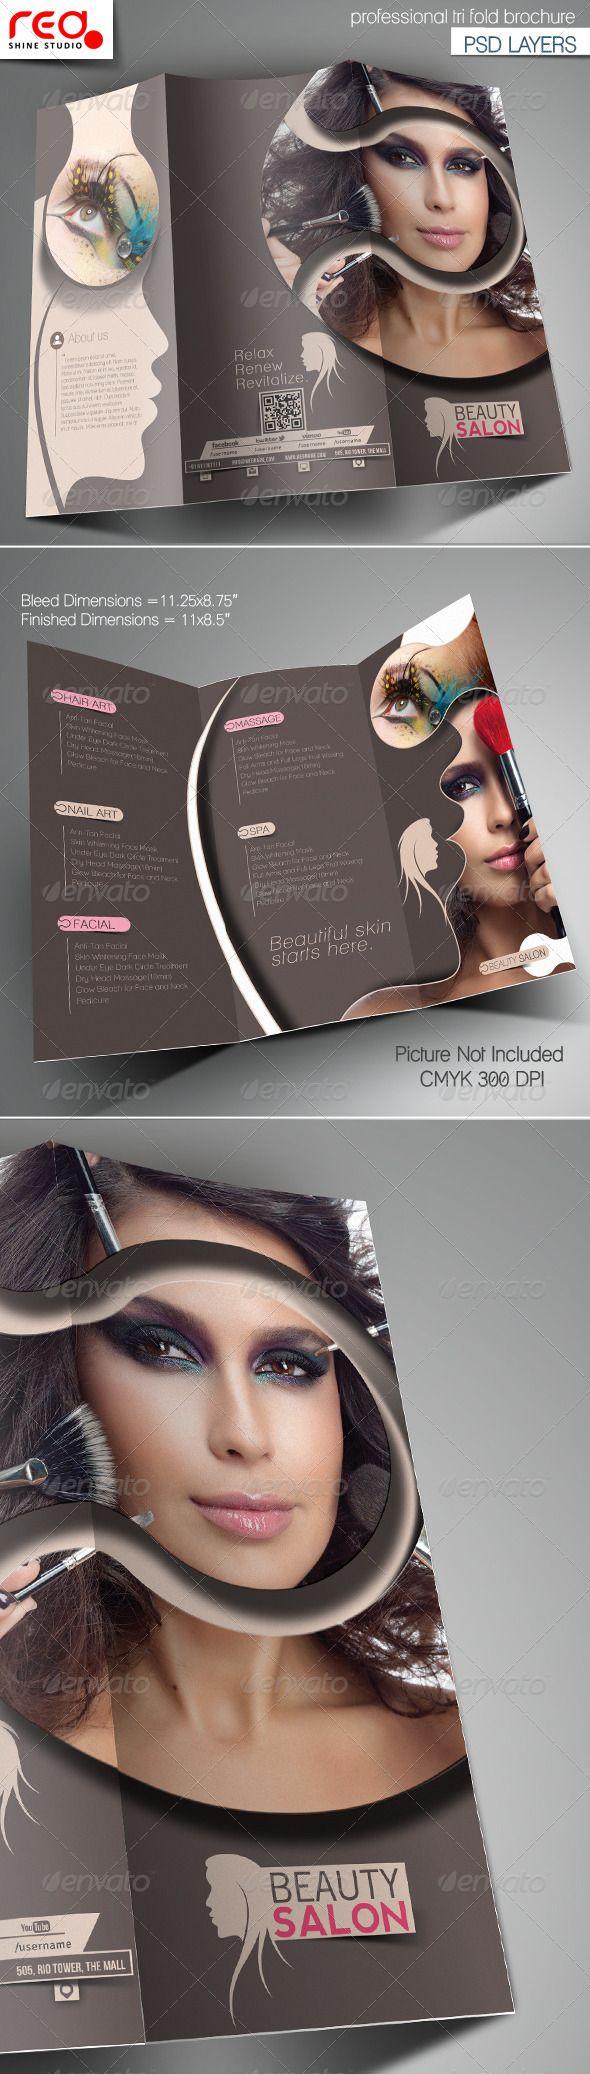 Beauty Salon Promotion Trifold Brochure Template